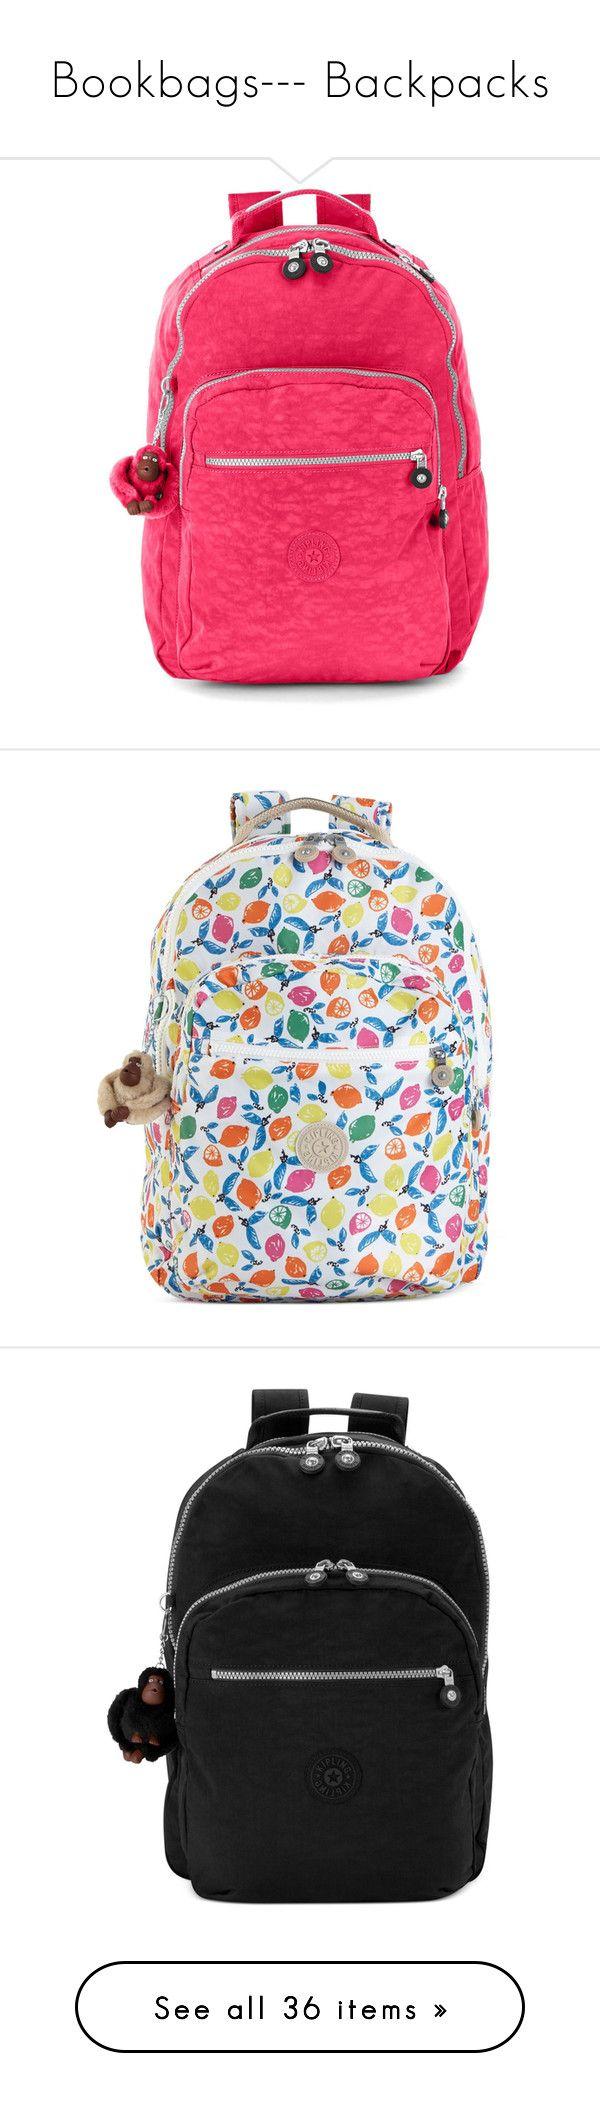 25 best ideas about kipling backpack on pinterest school handbags -  Bookbags Backpacks By Alicejean123 Liked On Polyvore Featuring Bags